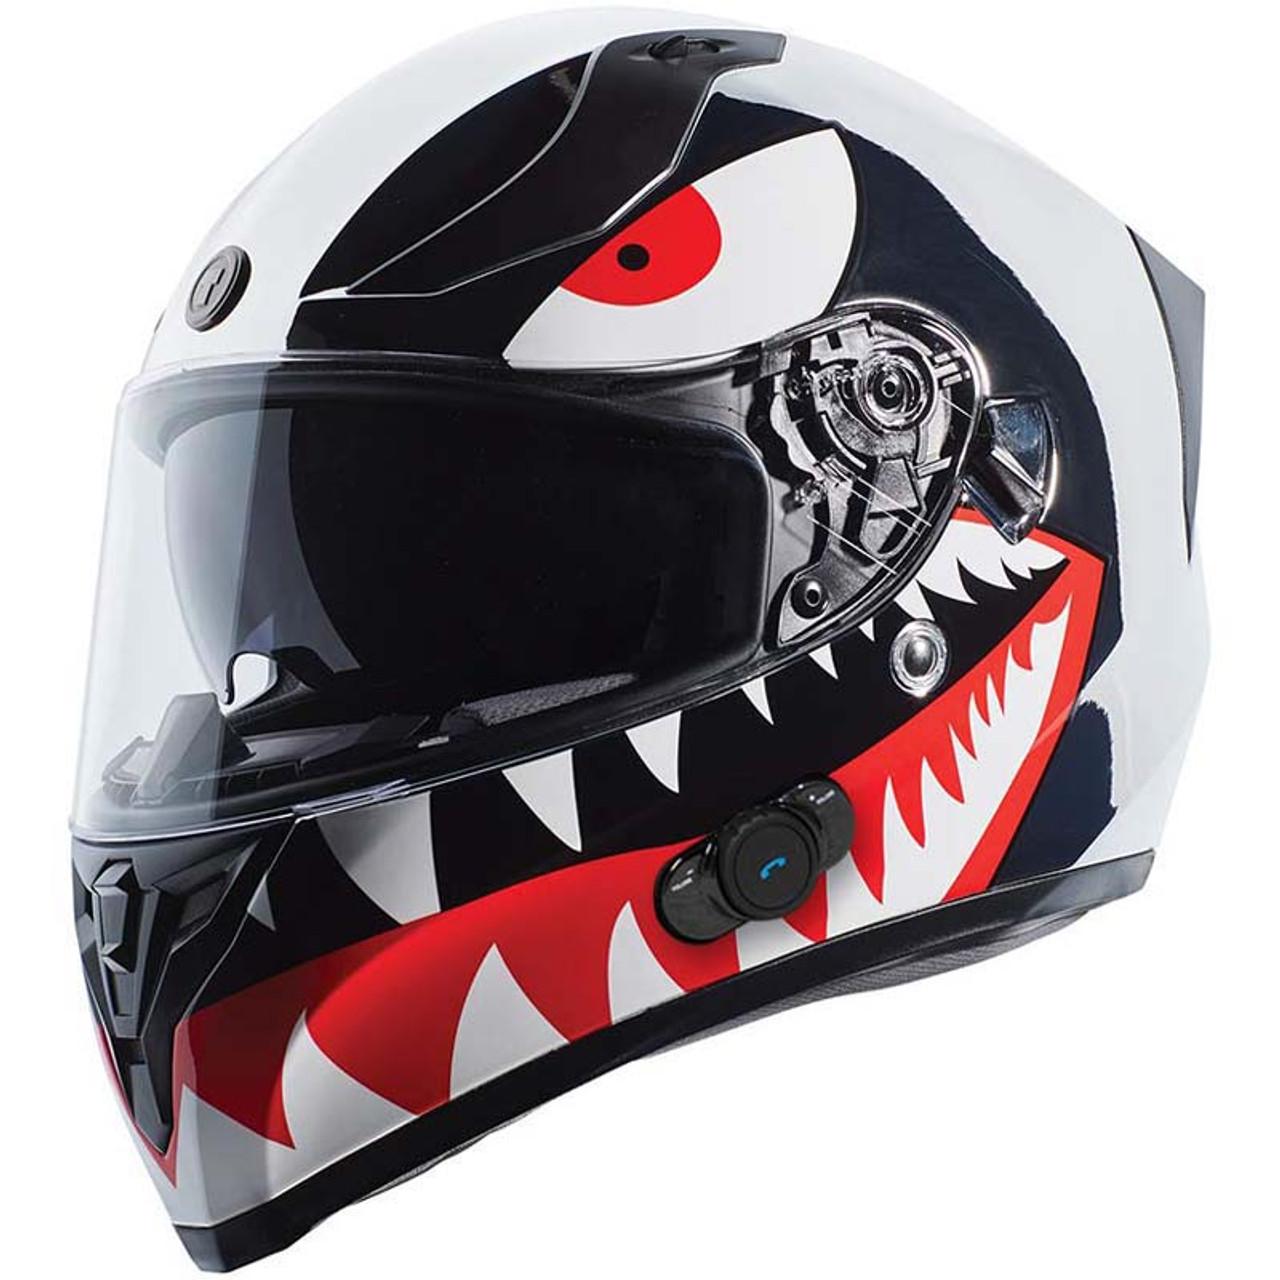 T15 Gloss Black Red Edge Dual Visor Full Face Motorcycle Helmet Sport Racing